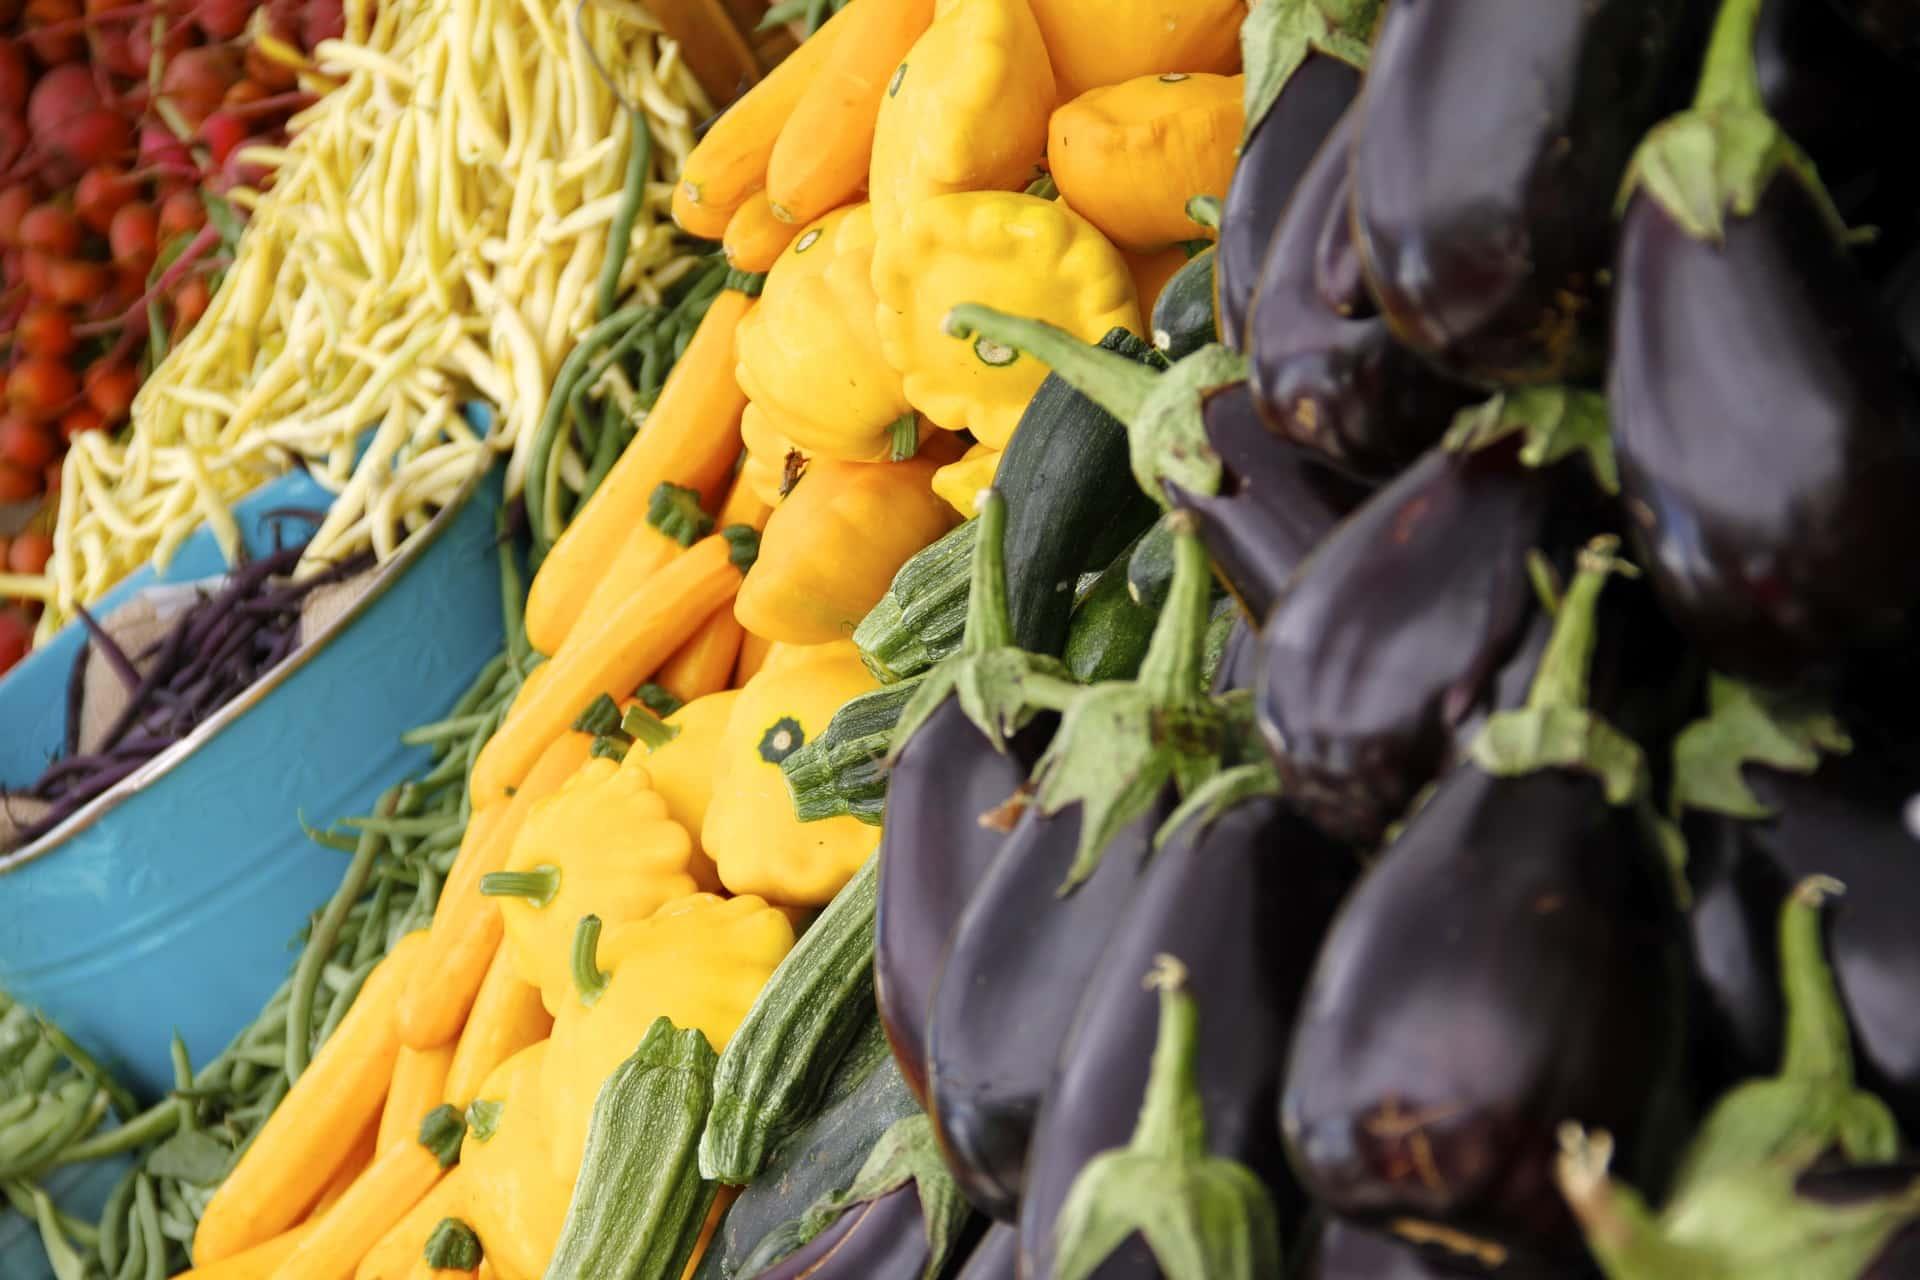 Americans Not Eating Their Fruits Veggies